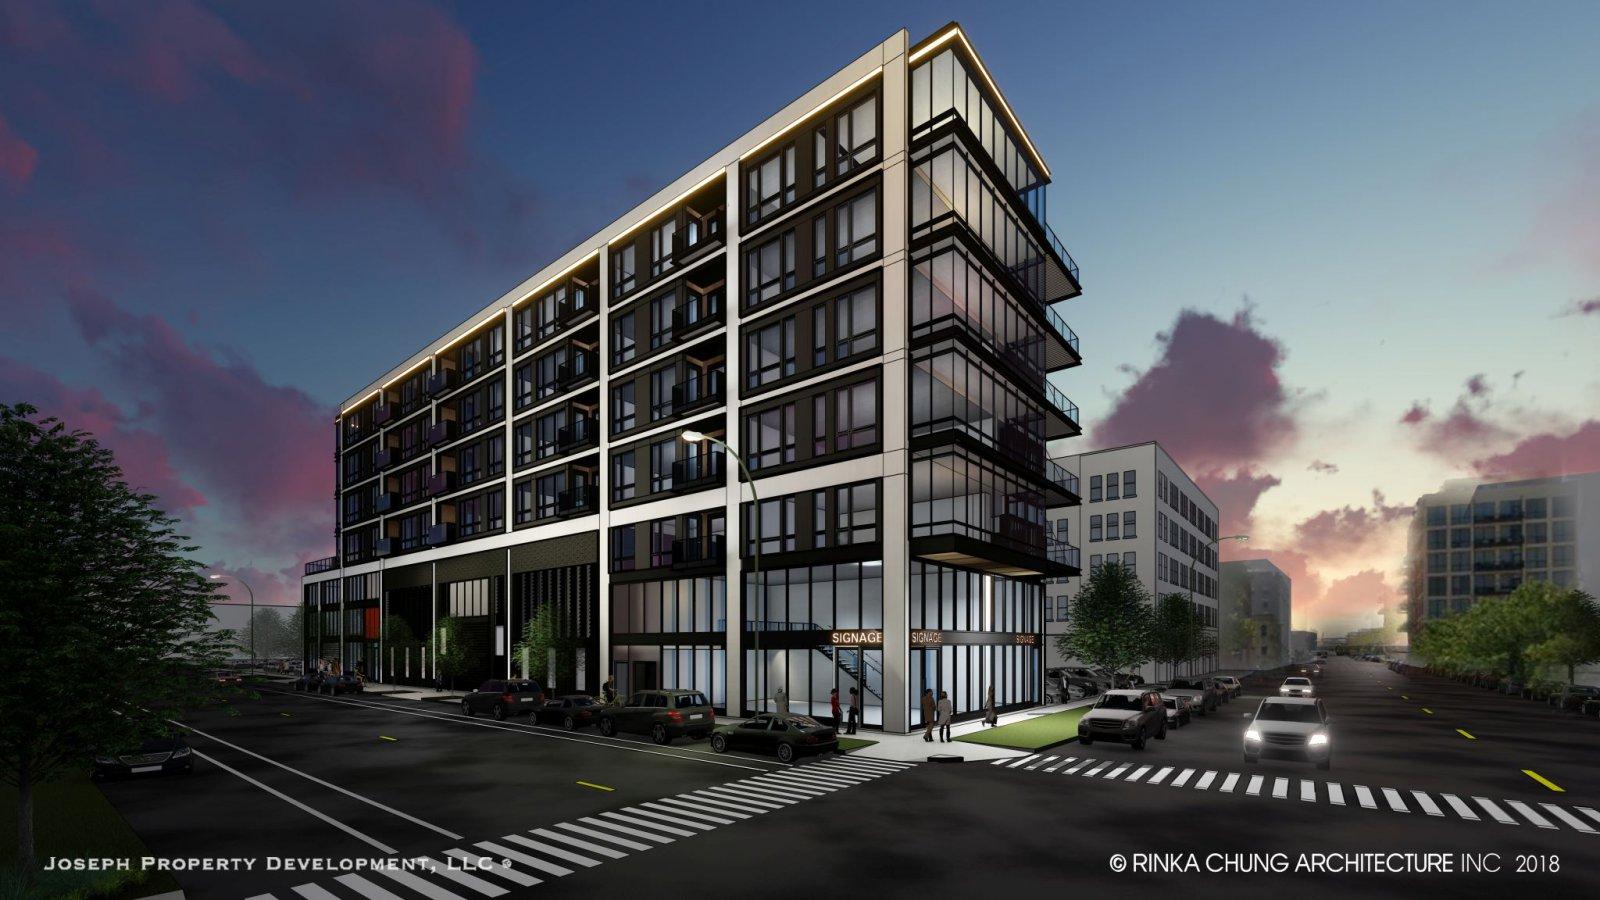 Joseph Property Development Third Ward Apartment Building Rendering